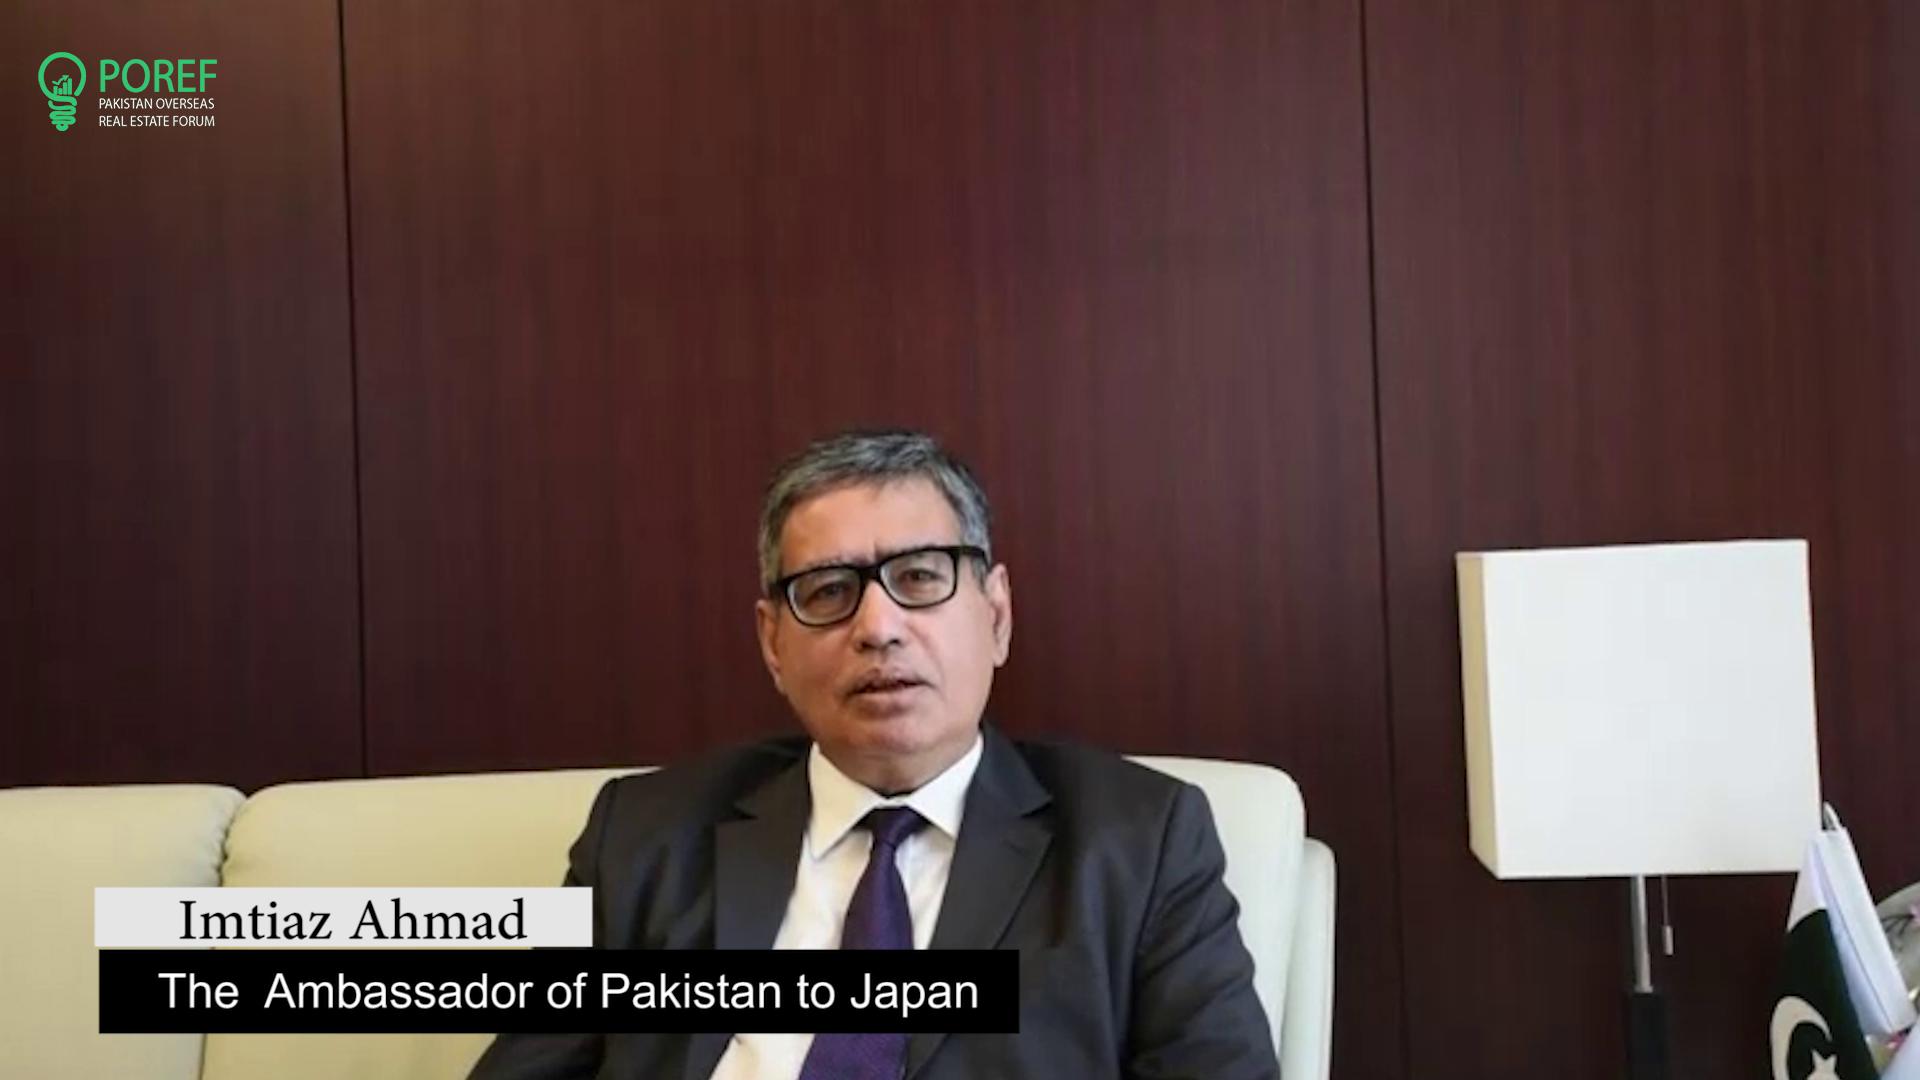 Imtiaz Ahmad, Ambassador of Pakistan to Japan